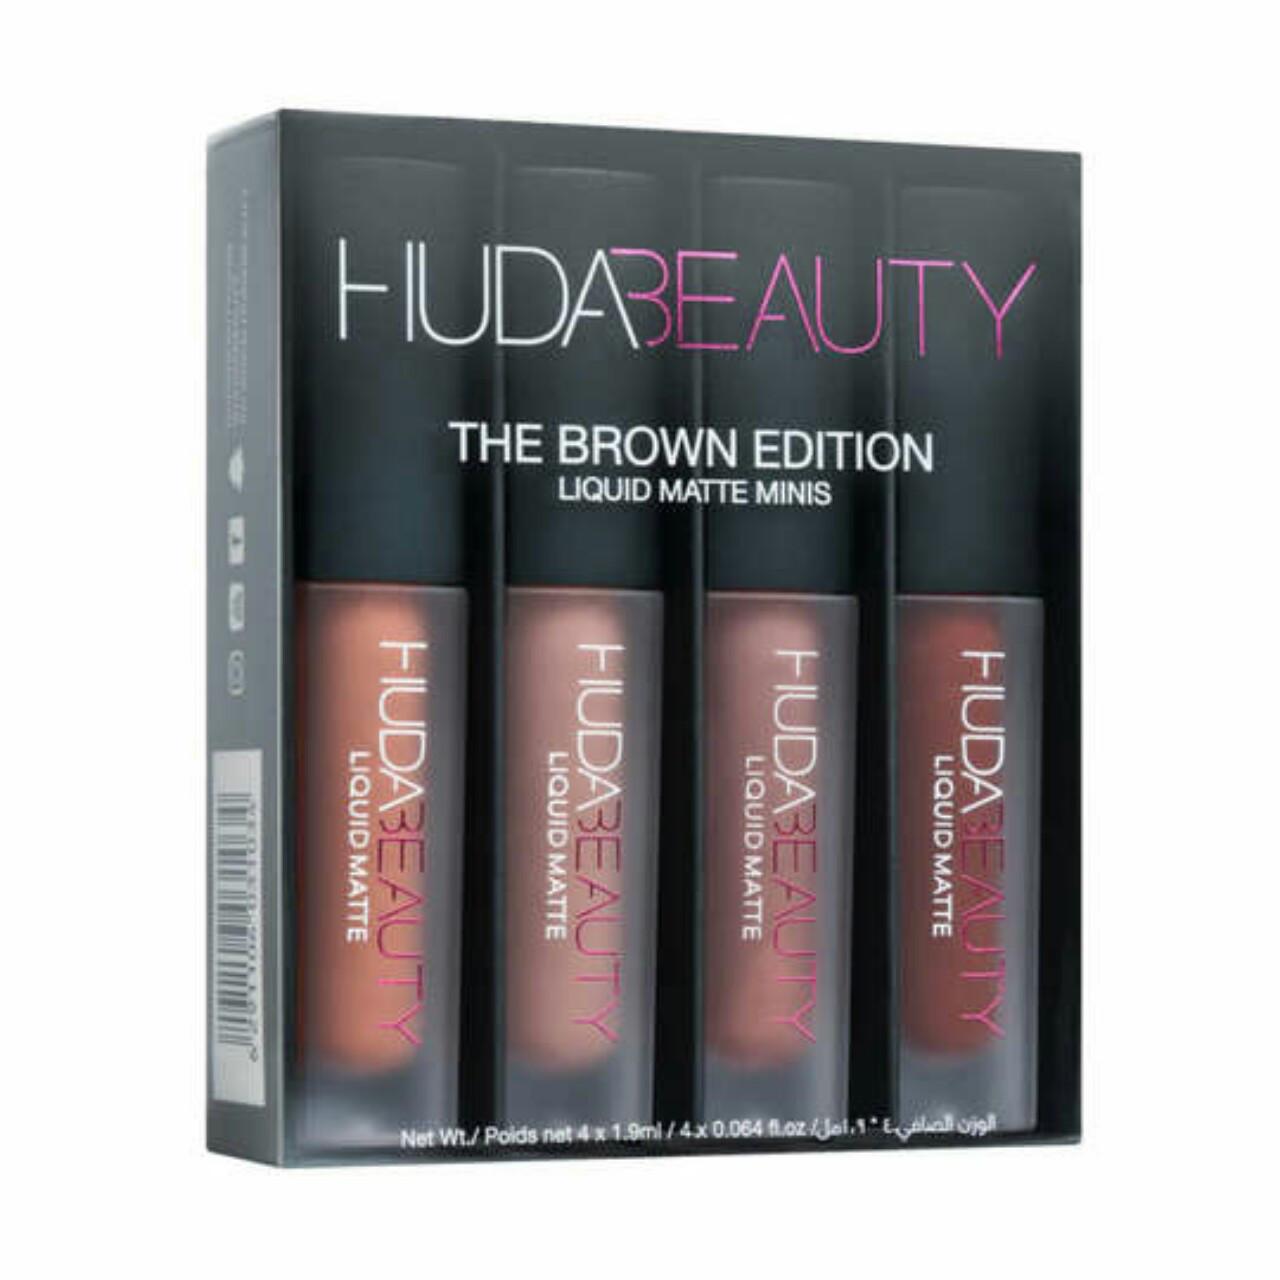 Набор жидких матовых помад Huda Beauty Liquid Matte Lipstick The Brown Edition